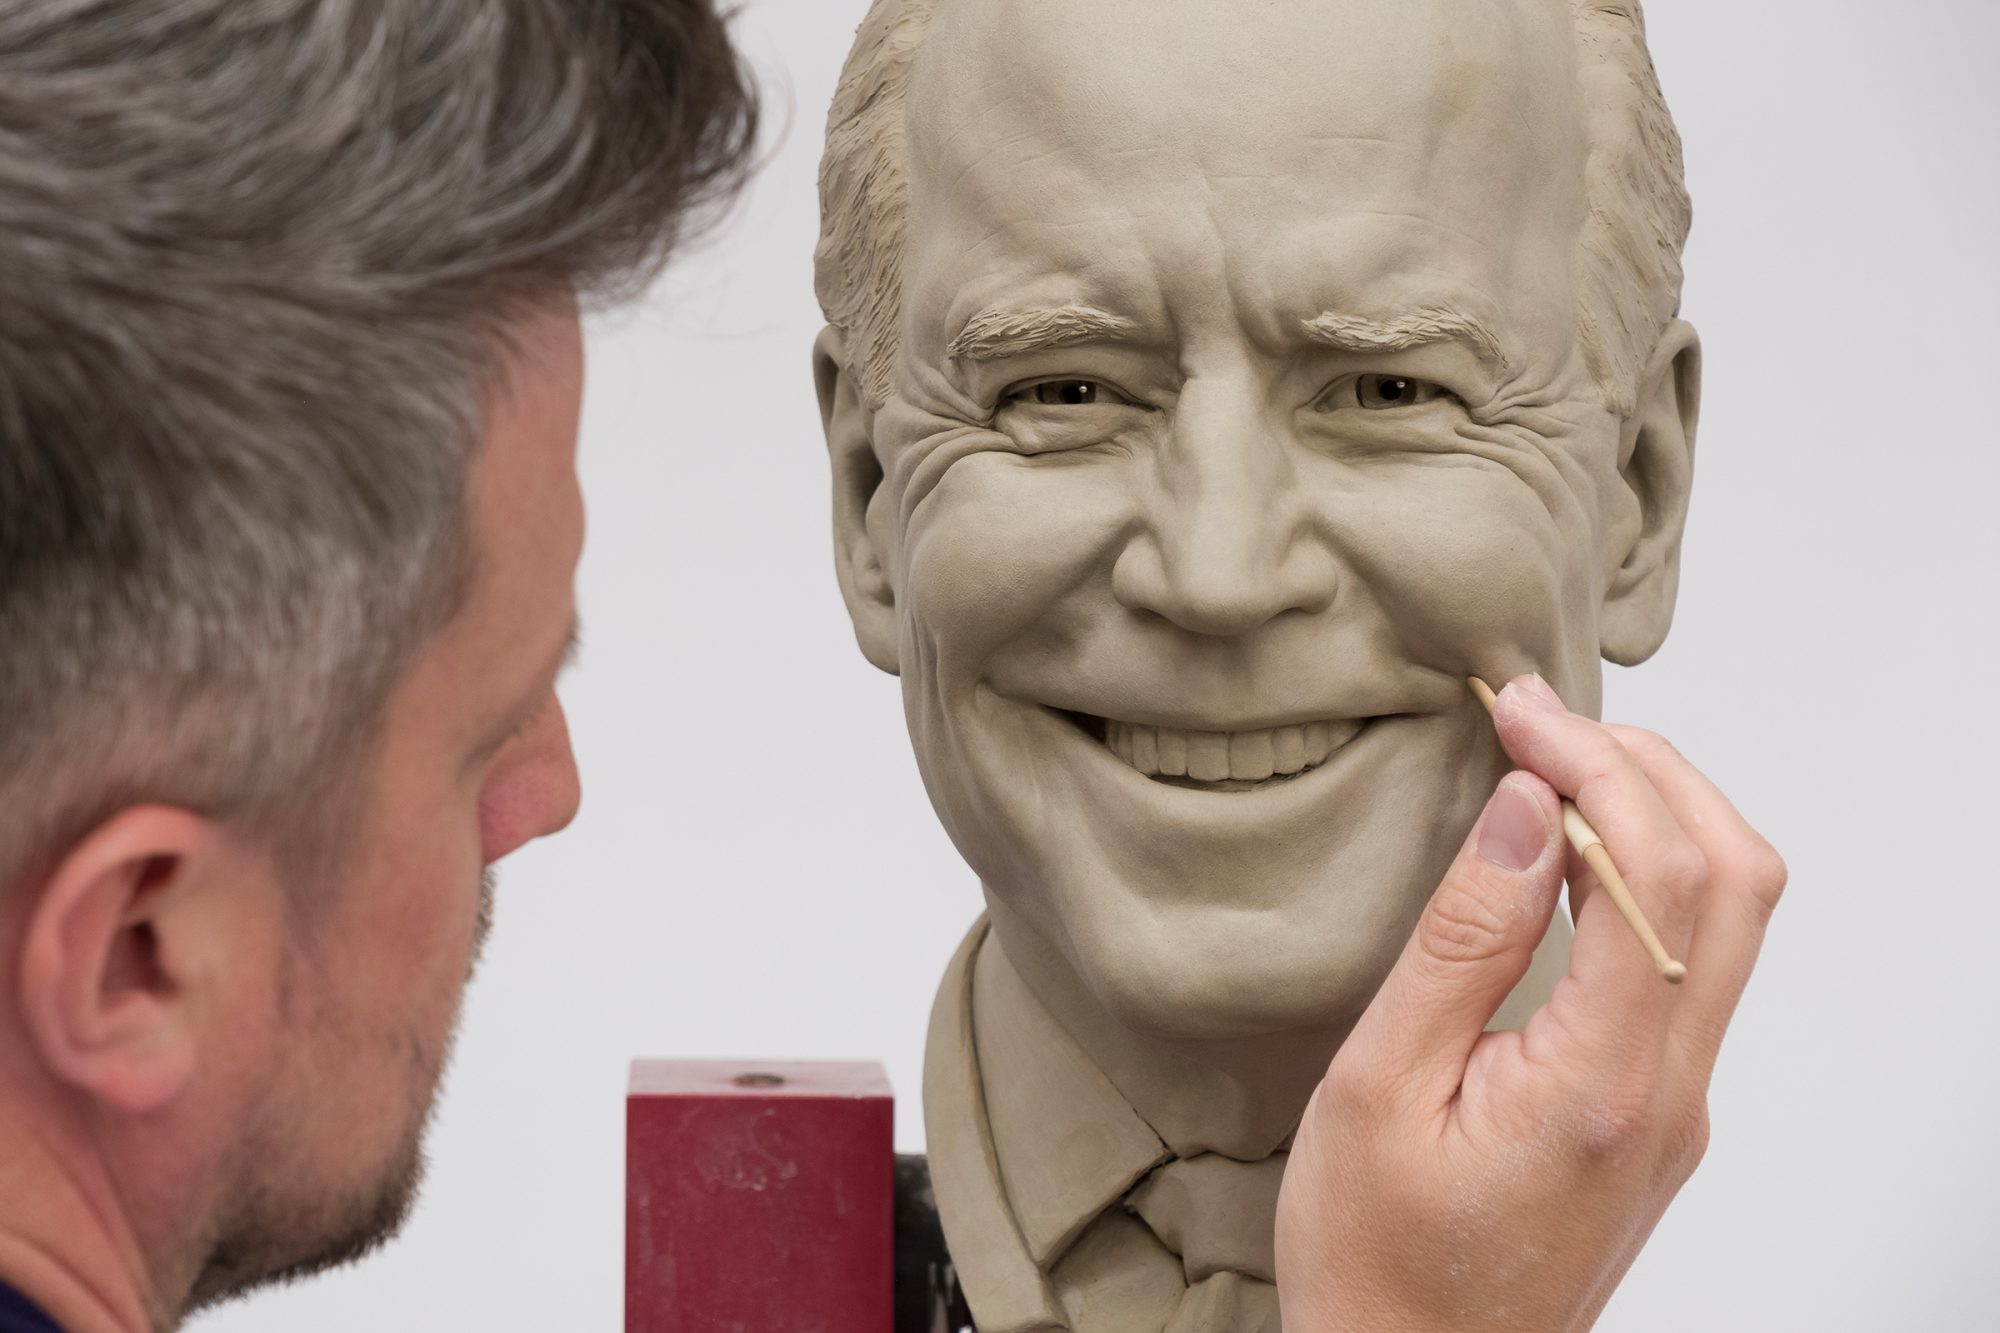 Preisdent Joe Biden Madame Tussaud's Wax Figure